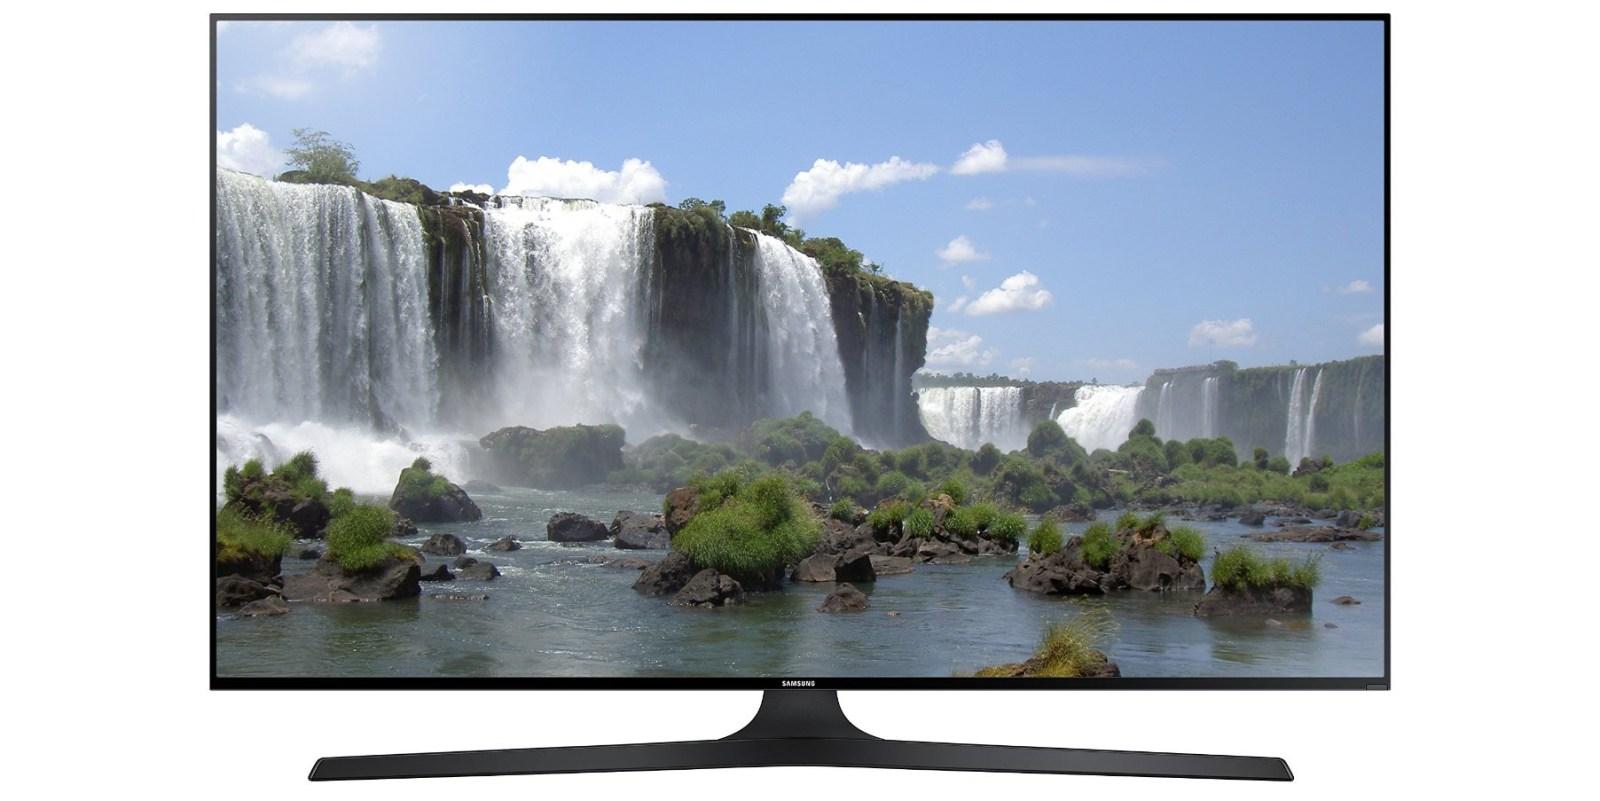 Samsung 50-inch 1080p 120Hz Smart LED HDTV: $545 shipped (Reg. $698+)